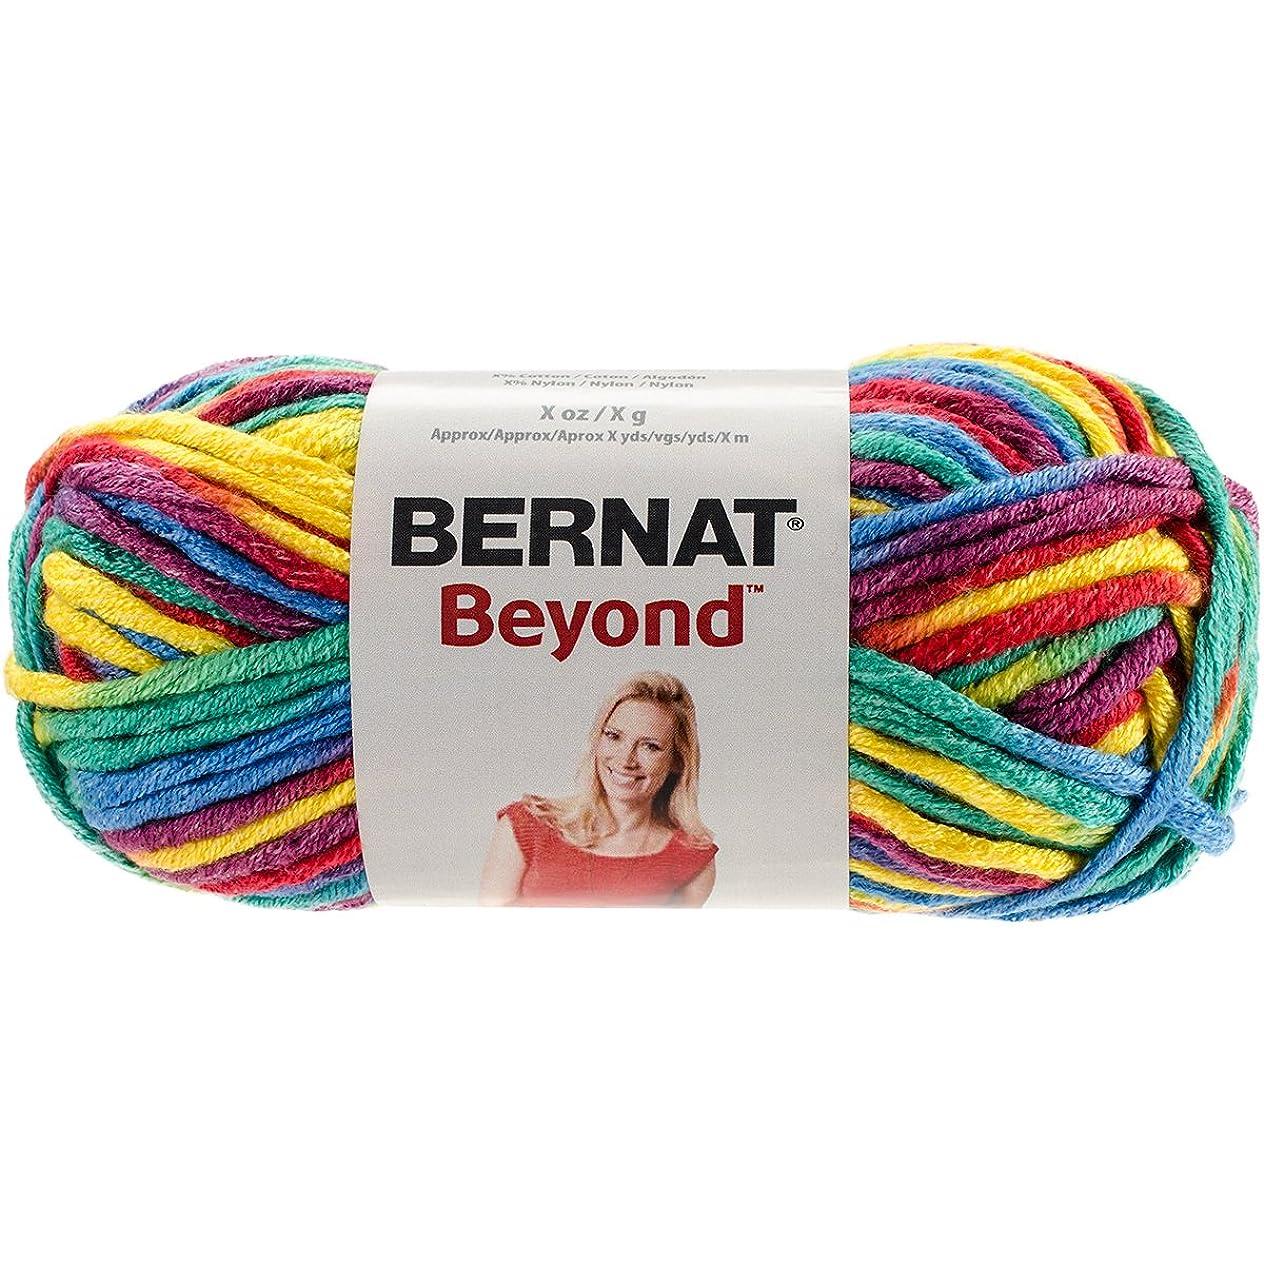 Bernat Beyond Yarn, 4.2 oz, Gauge 6 Super Bulky Chunky, Rainbow Kid Variegate xcsvzhiq459